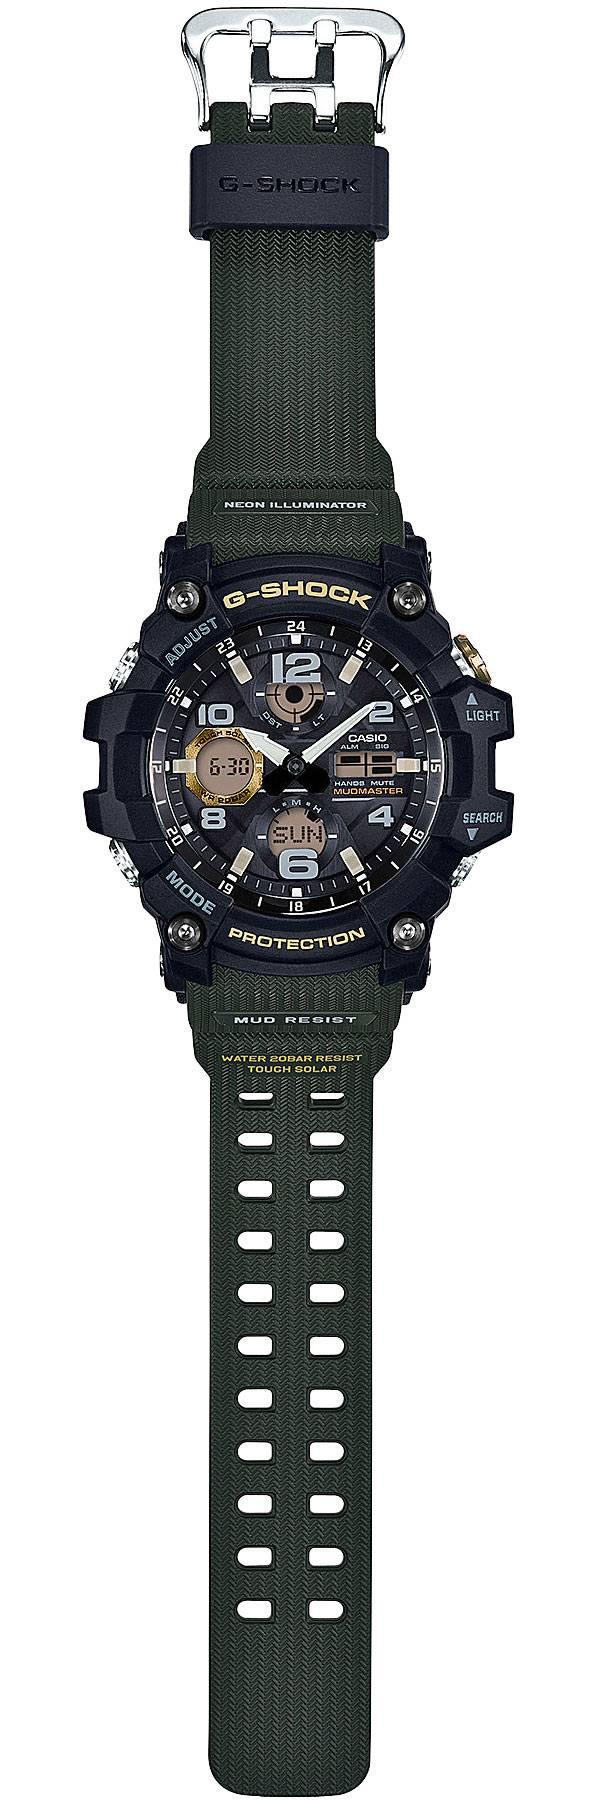 G-SHOCK Mudmaster Solar Watch product image